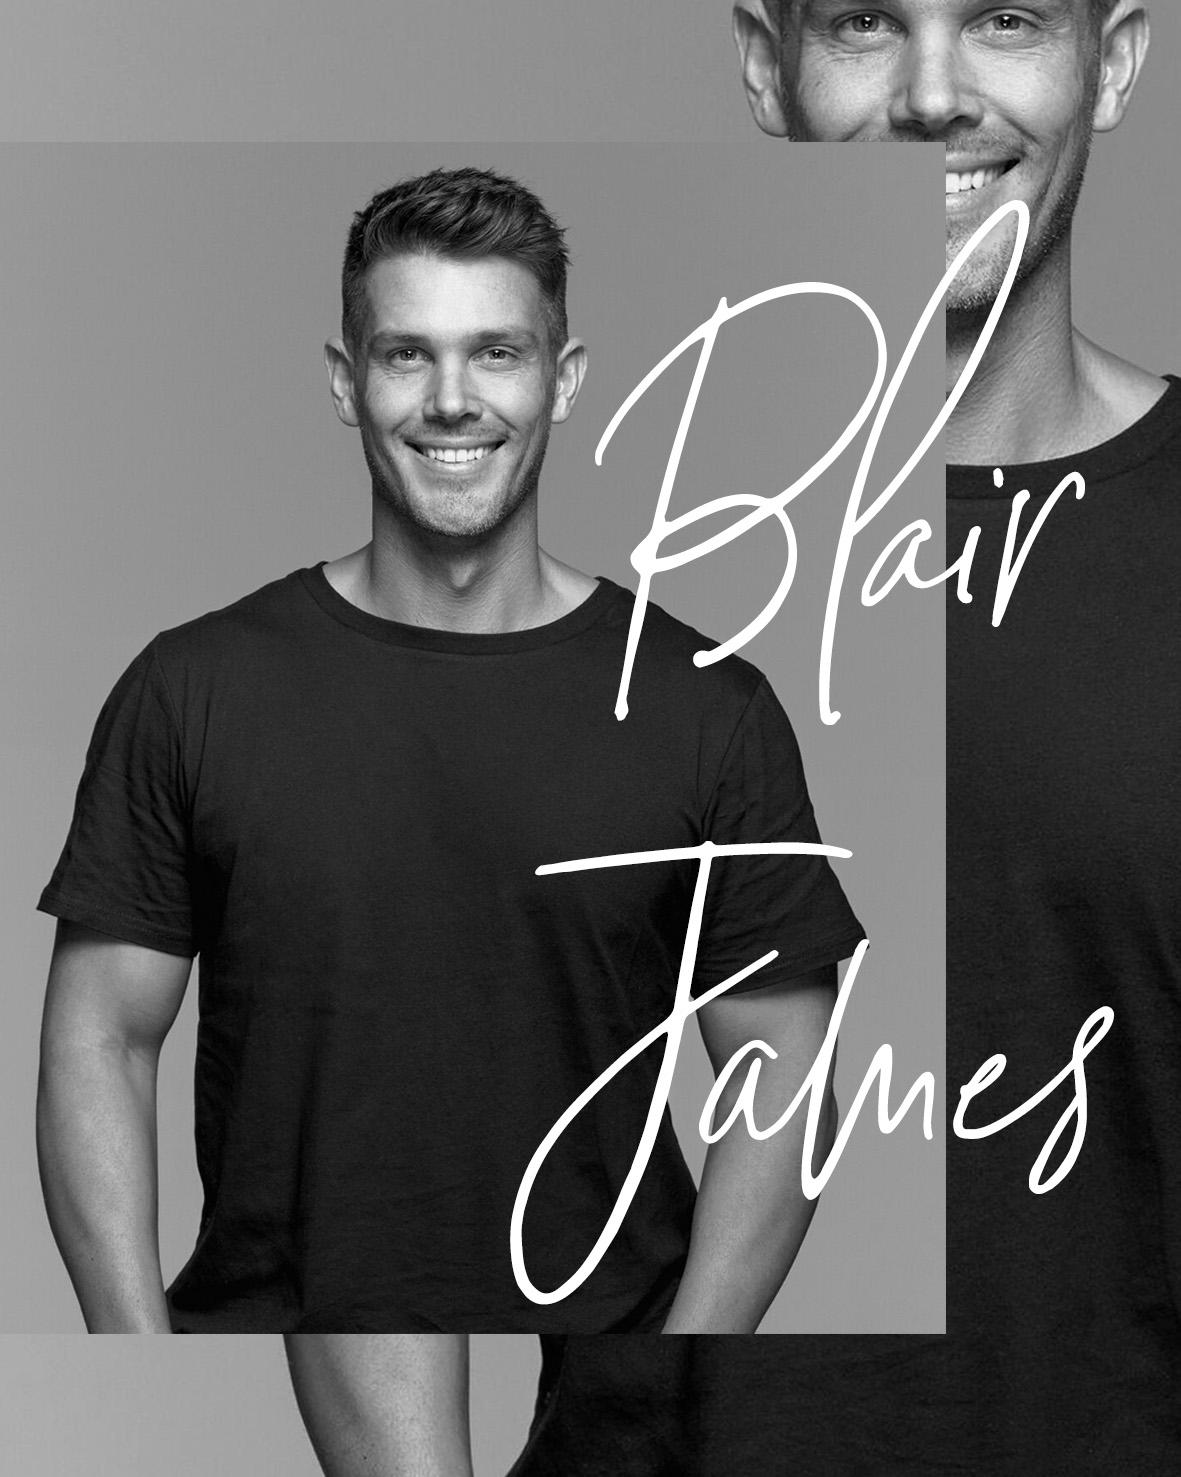 Blair James